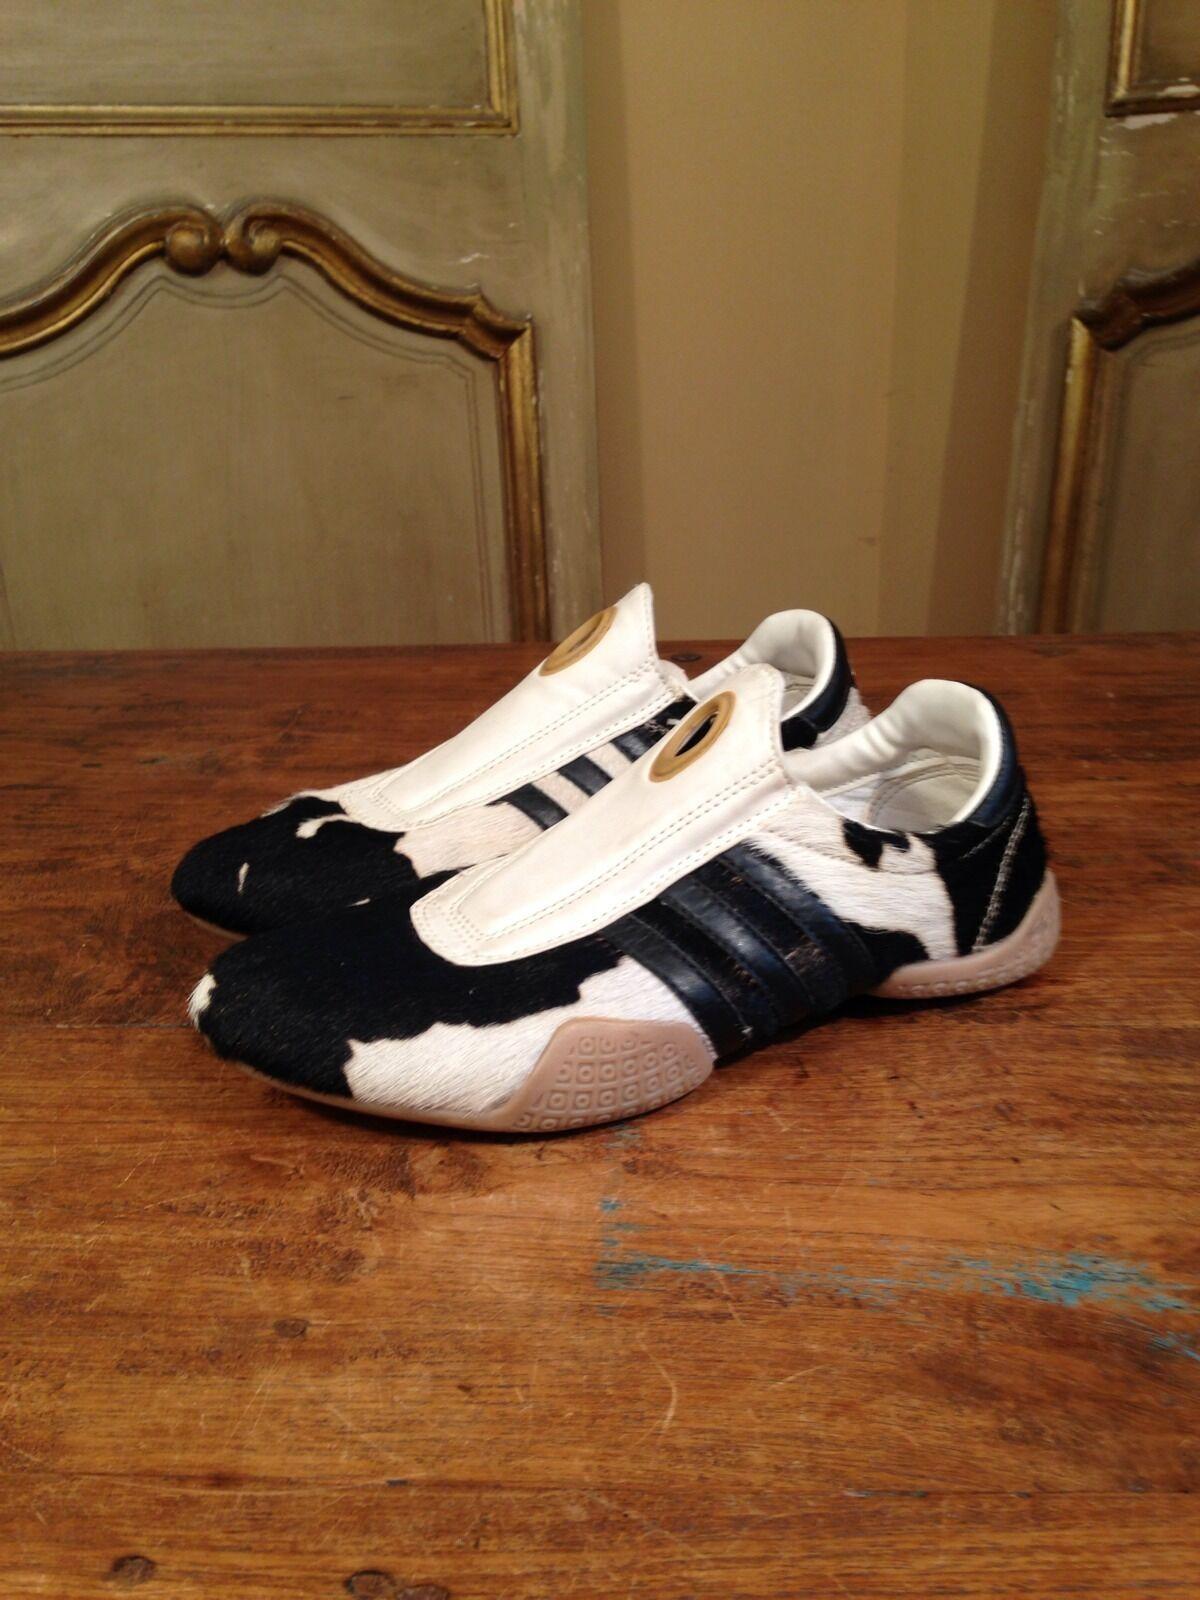 la fourrure des chaussures baskets adidas os baskets chaussures taille 8 propre!rare! 098bdf